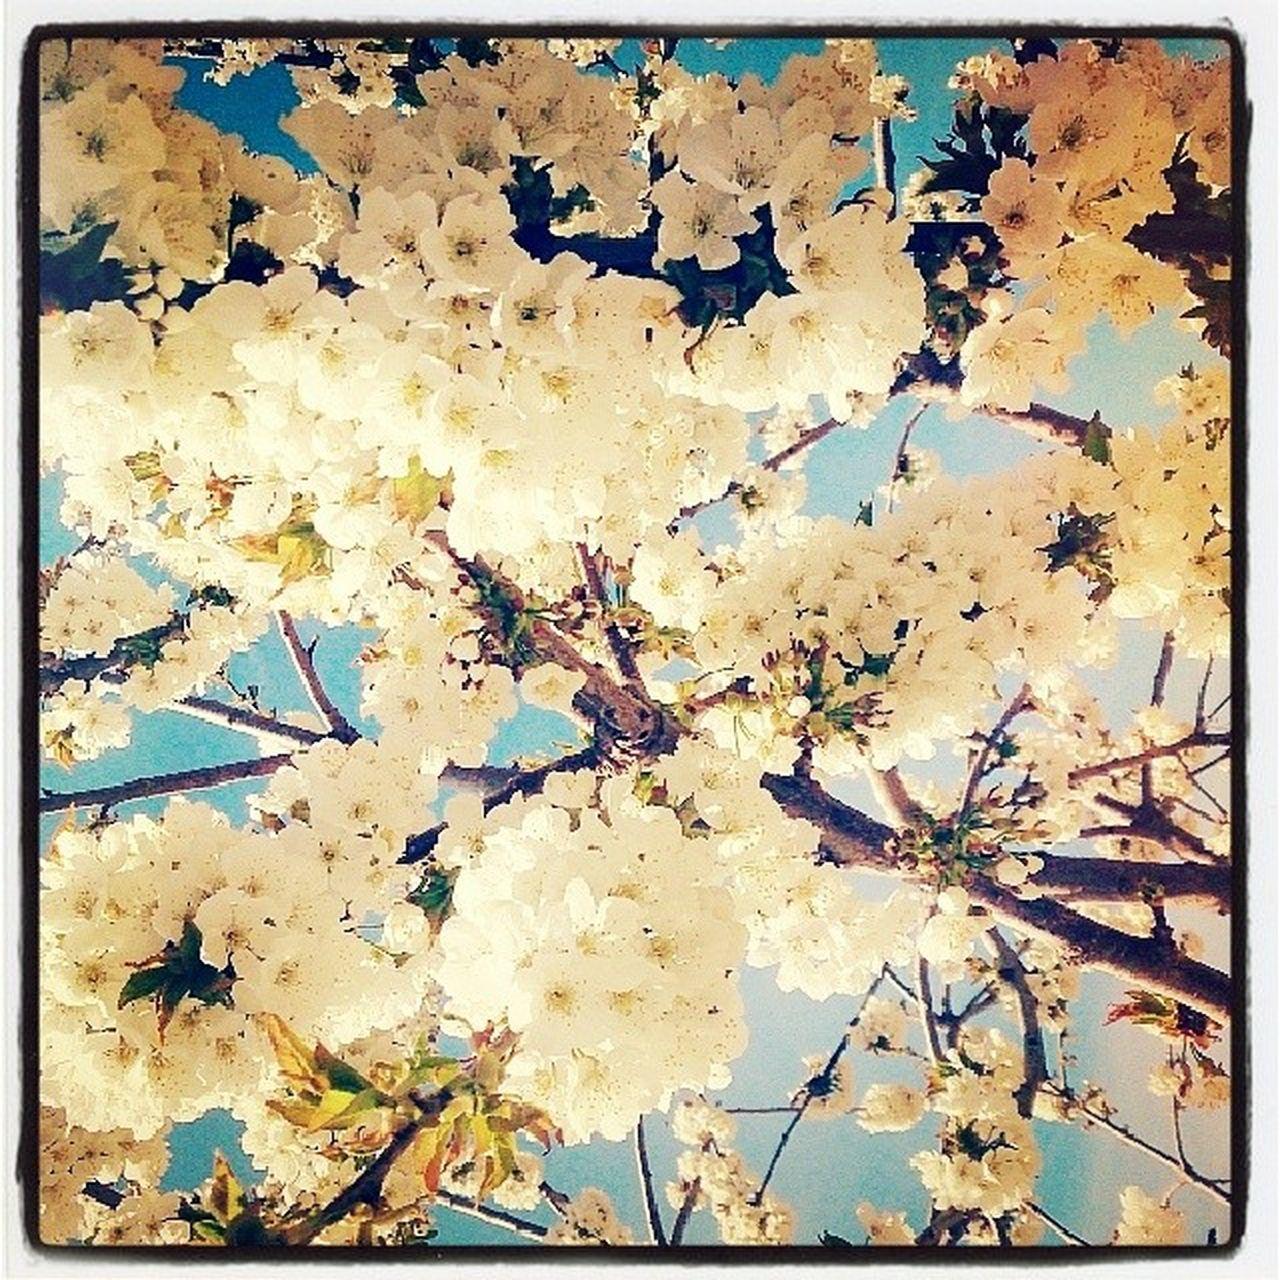 La primavera trompetera ya llego! Spring Bontemps Jaerahora Totdistreu Aixoesvida Aixoesfantastic Deuesgran Dimecres Feliçdianormal Moiaesmoltmoia Moiaesmoltmesqueundeute Tardesdedimecres